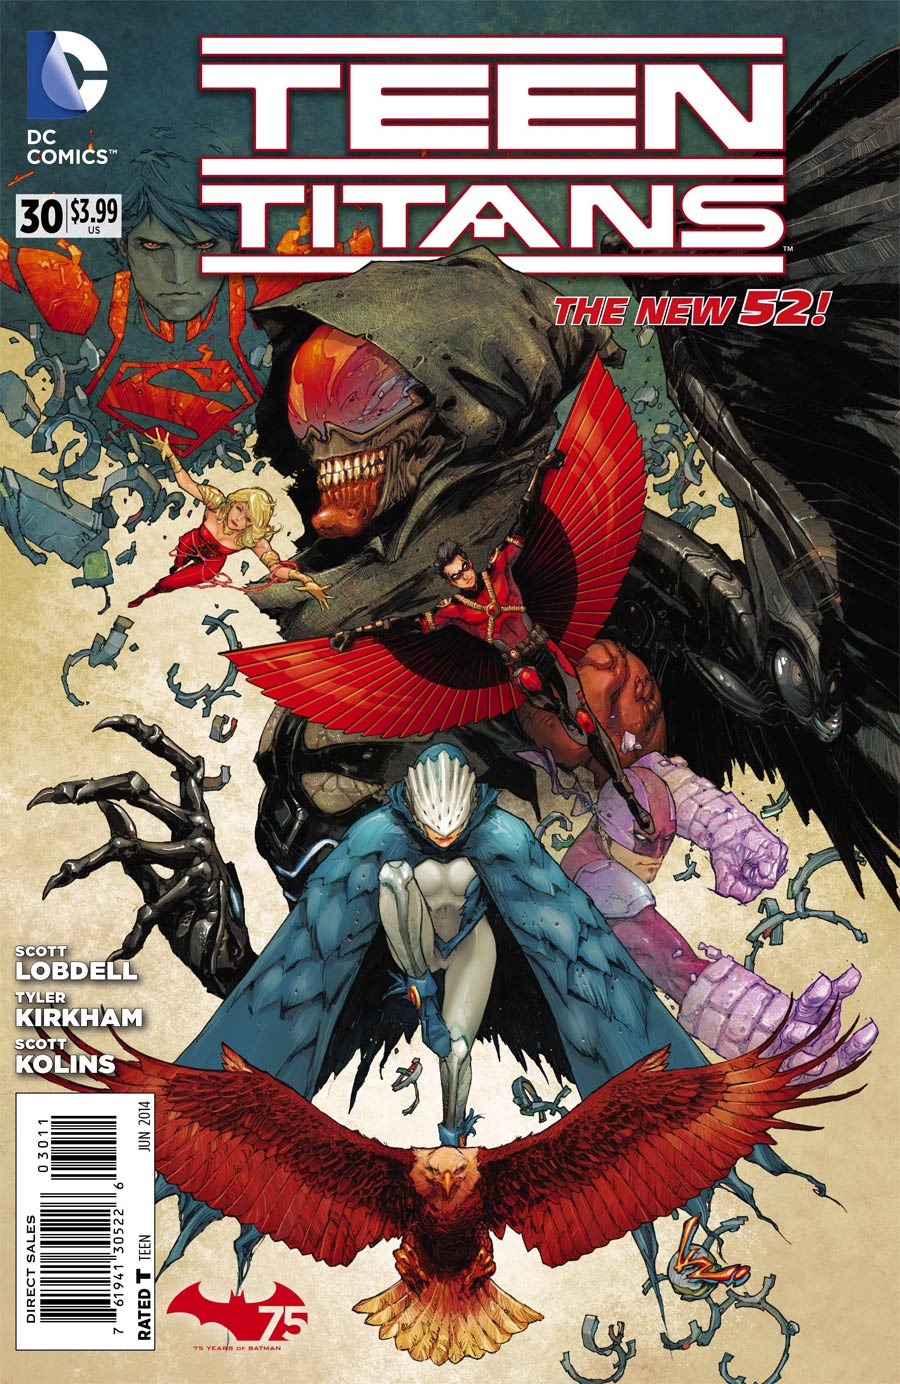 Teen Titans Vol 4 #30 Cover A Regular Kenneth Rocafort Cover